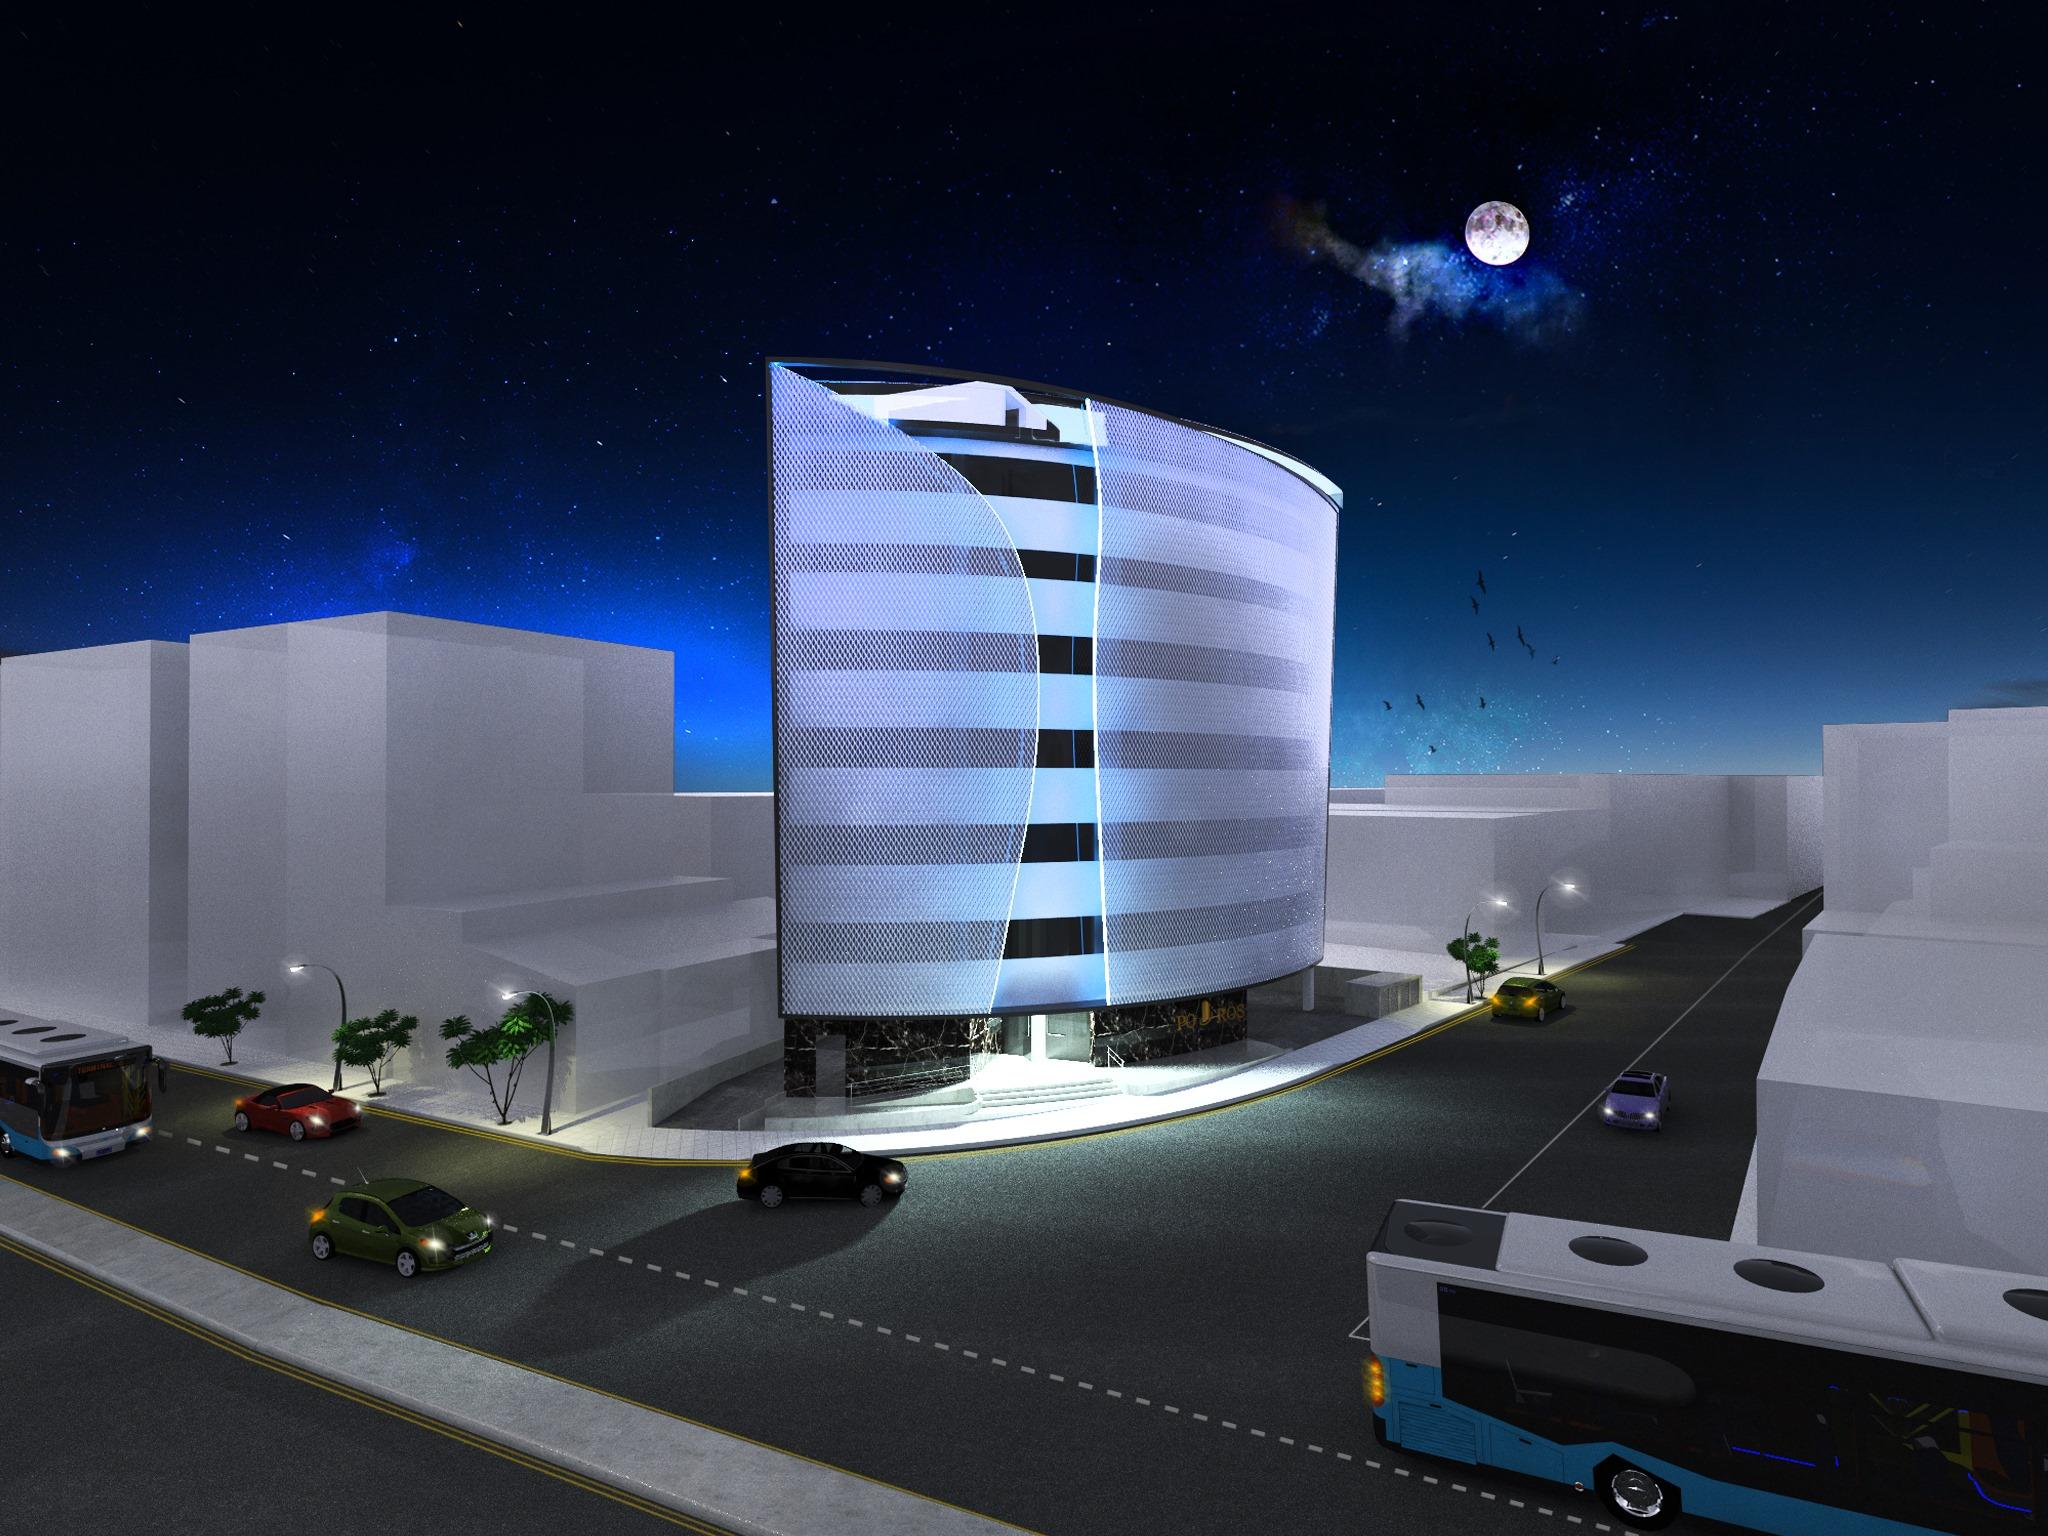 Brand New Business Center located city center next to Limassol Court